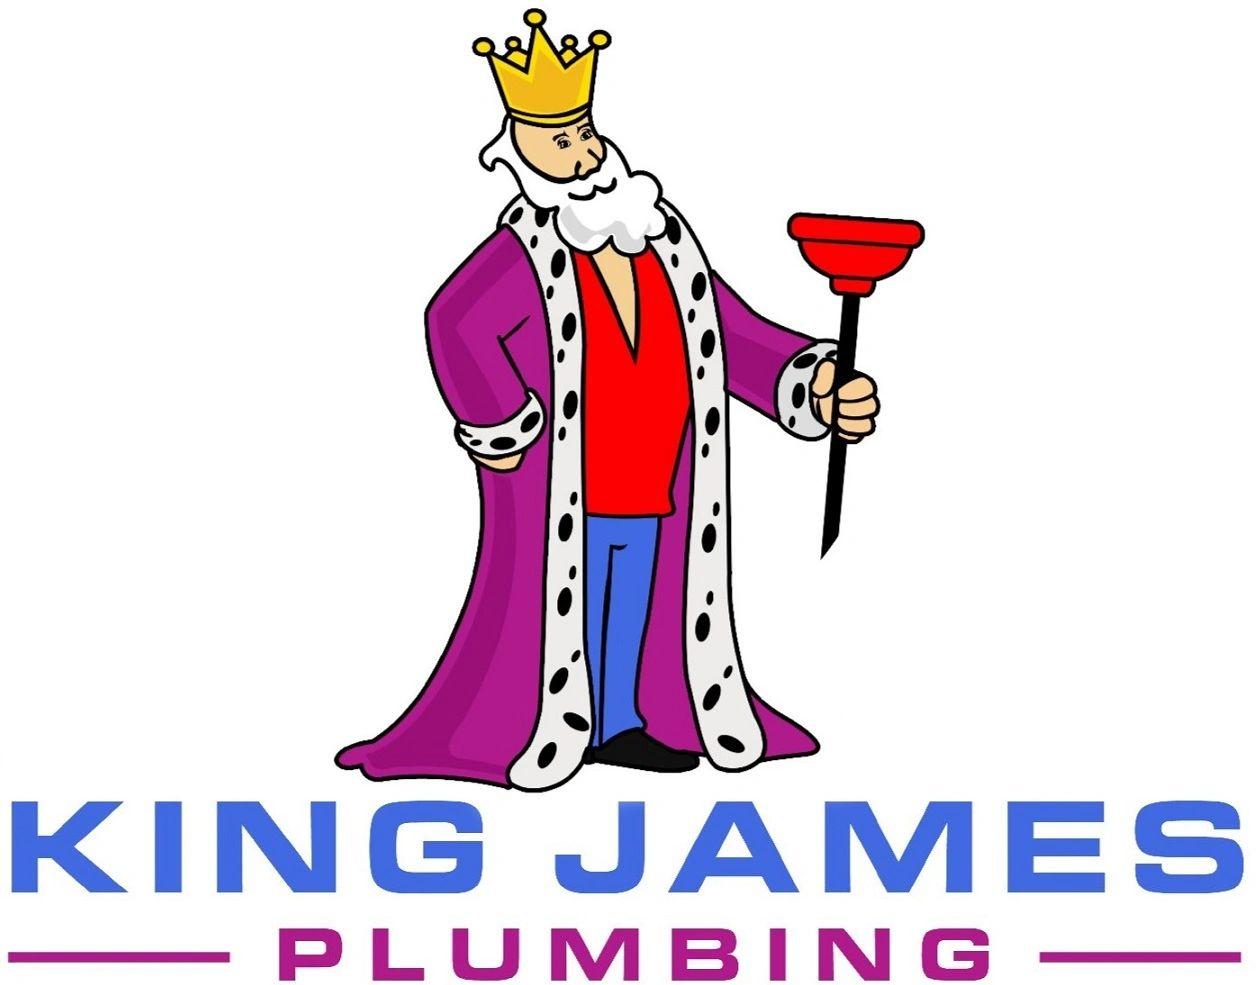 King James Plumbing Plumbing Water Heater Tankless Water Heater